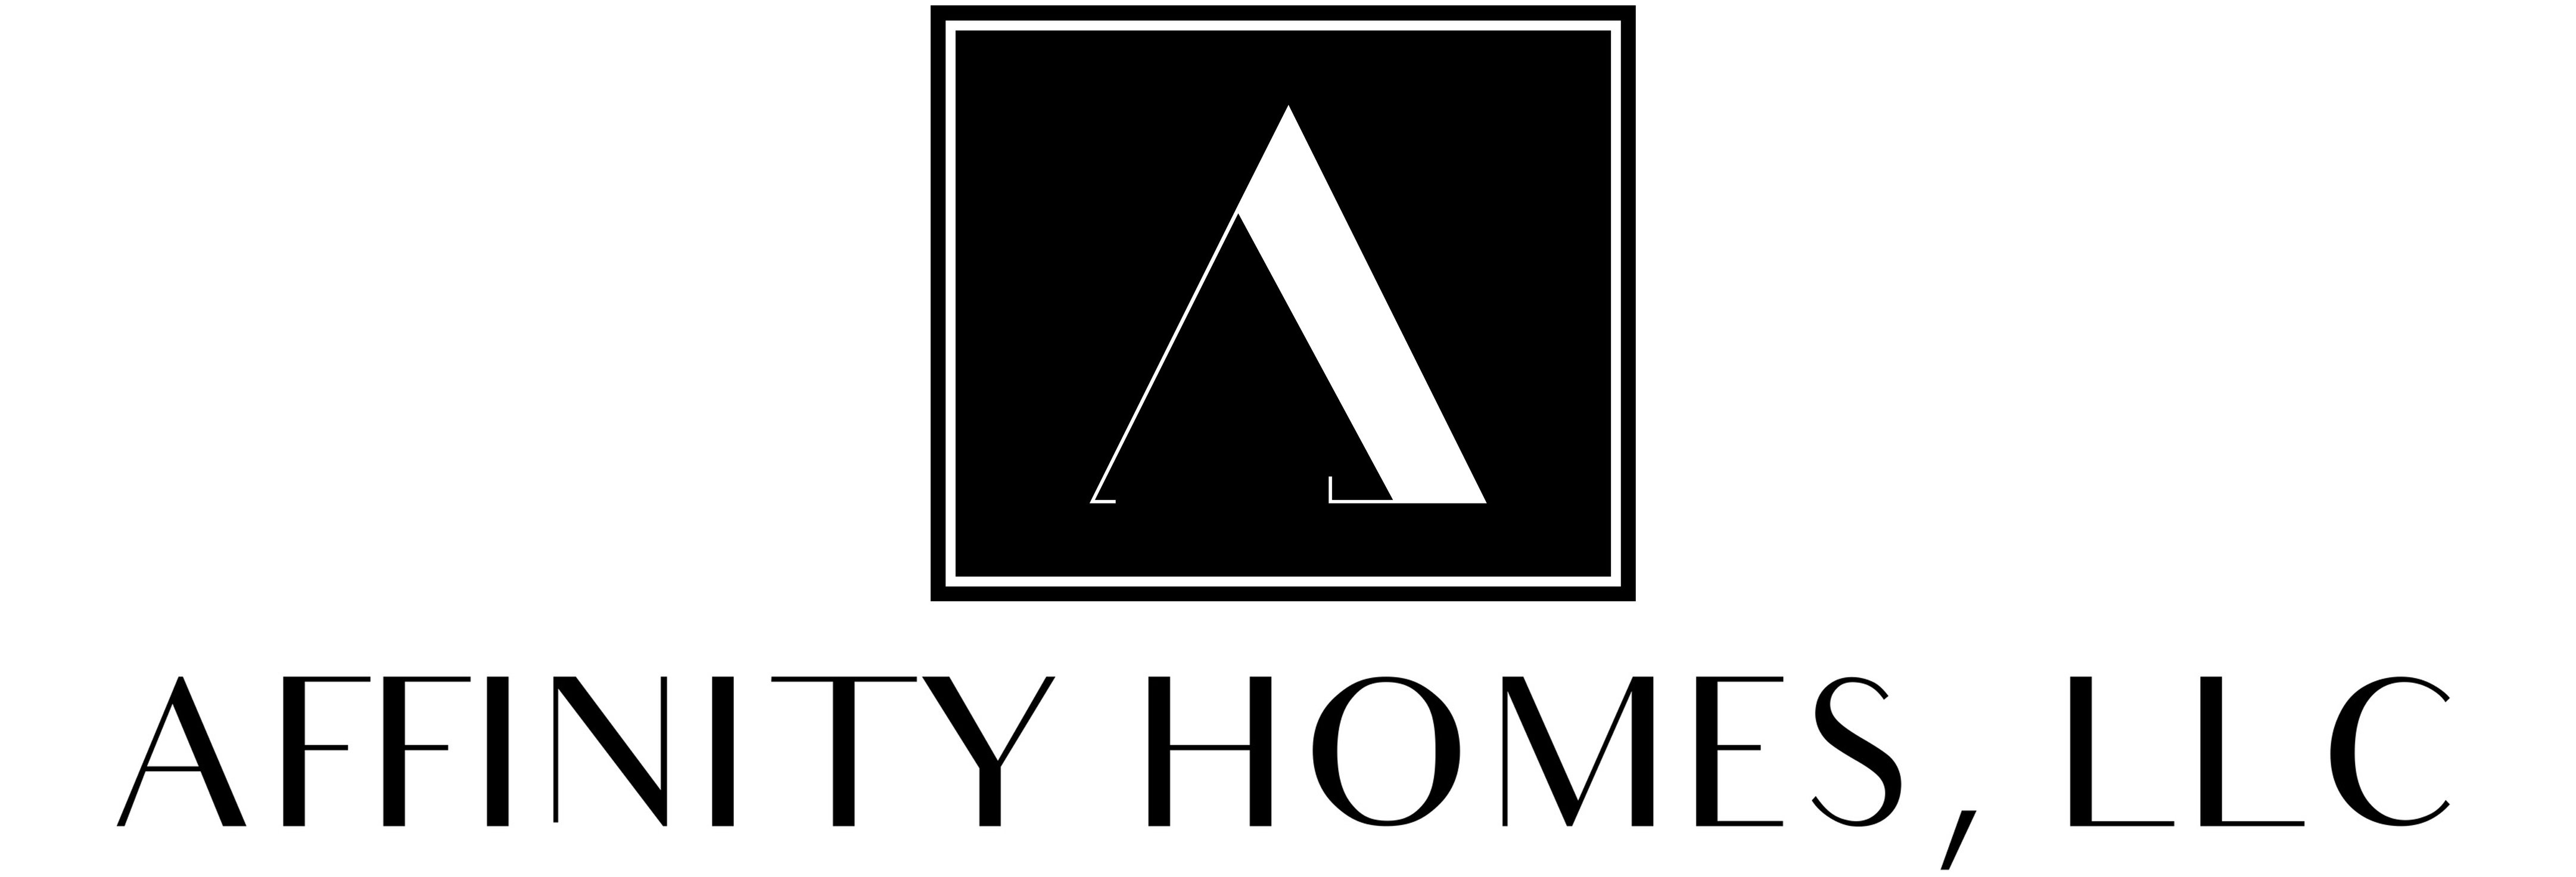 Affinity Homes, LLC